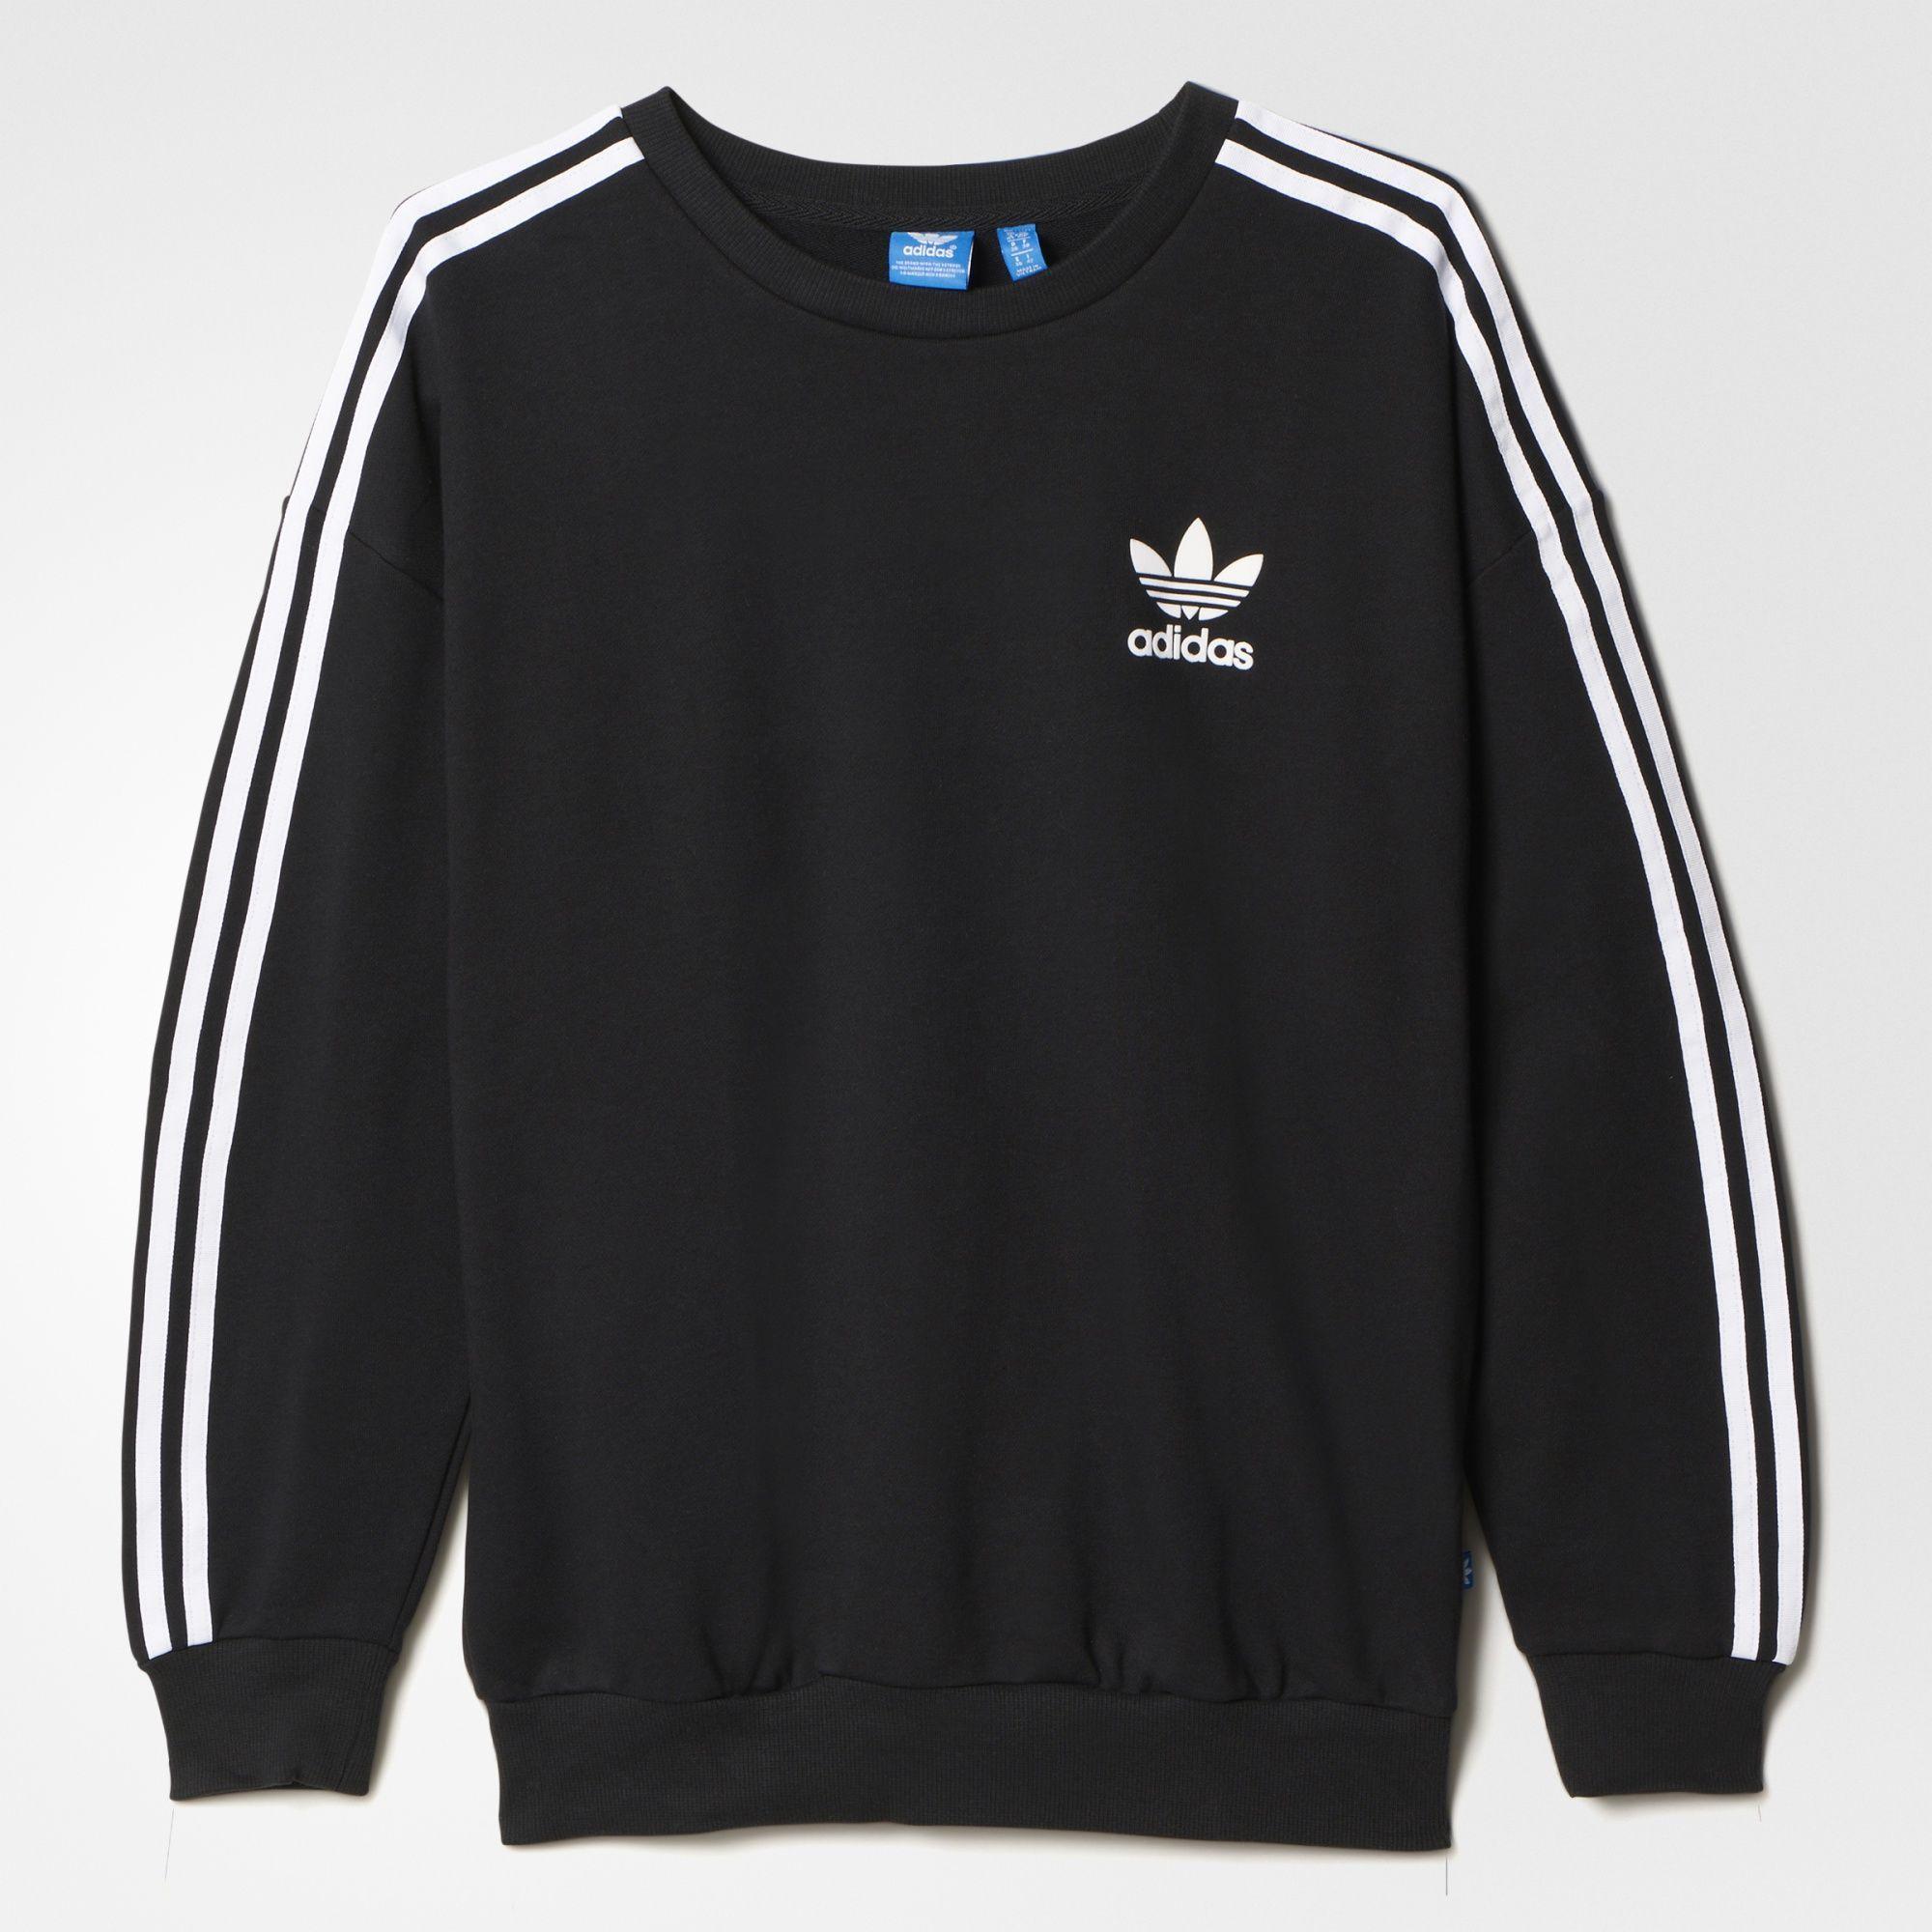 Adidas 3 Streifen Sweatshirt Adidas Sweats Adidas Women Striped Sweatshirts